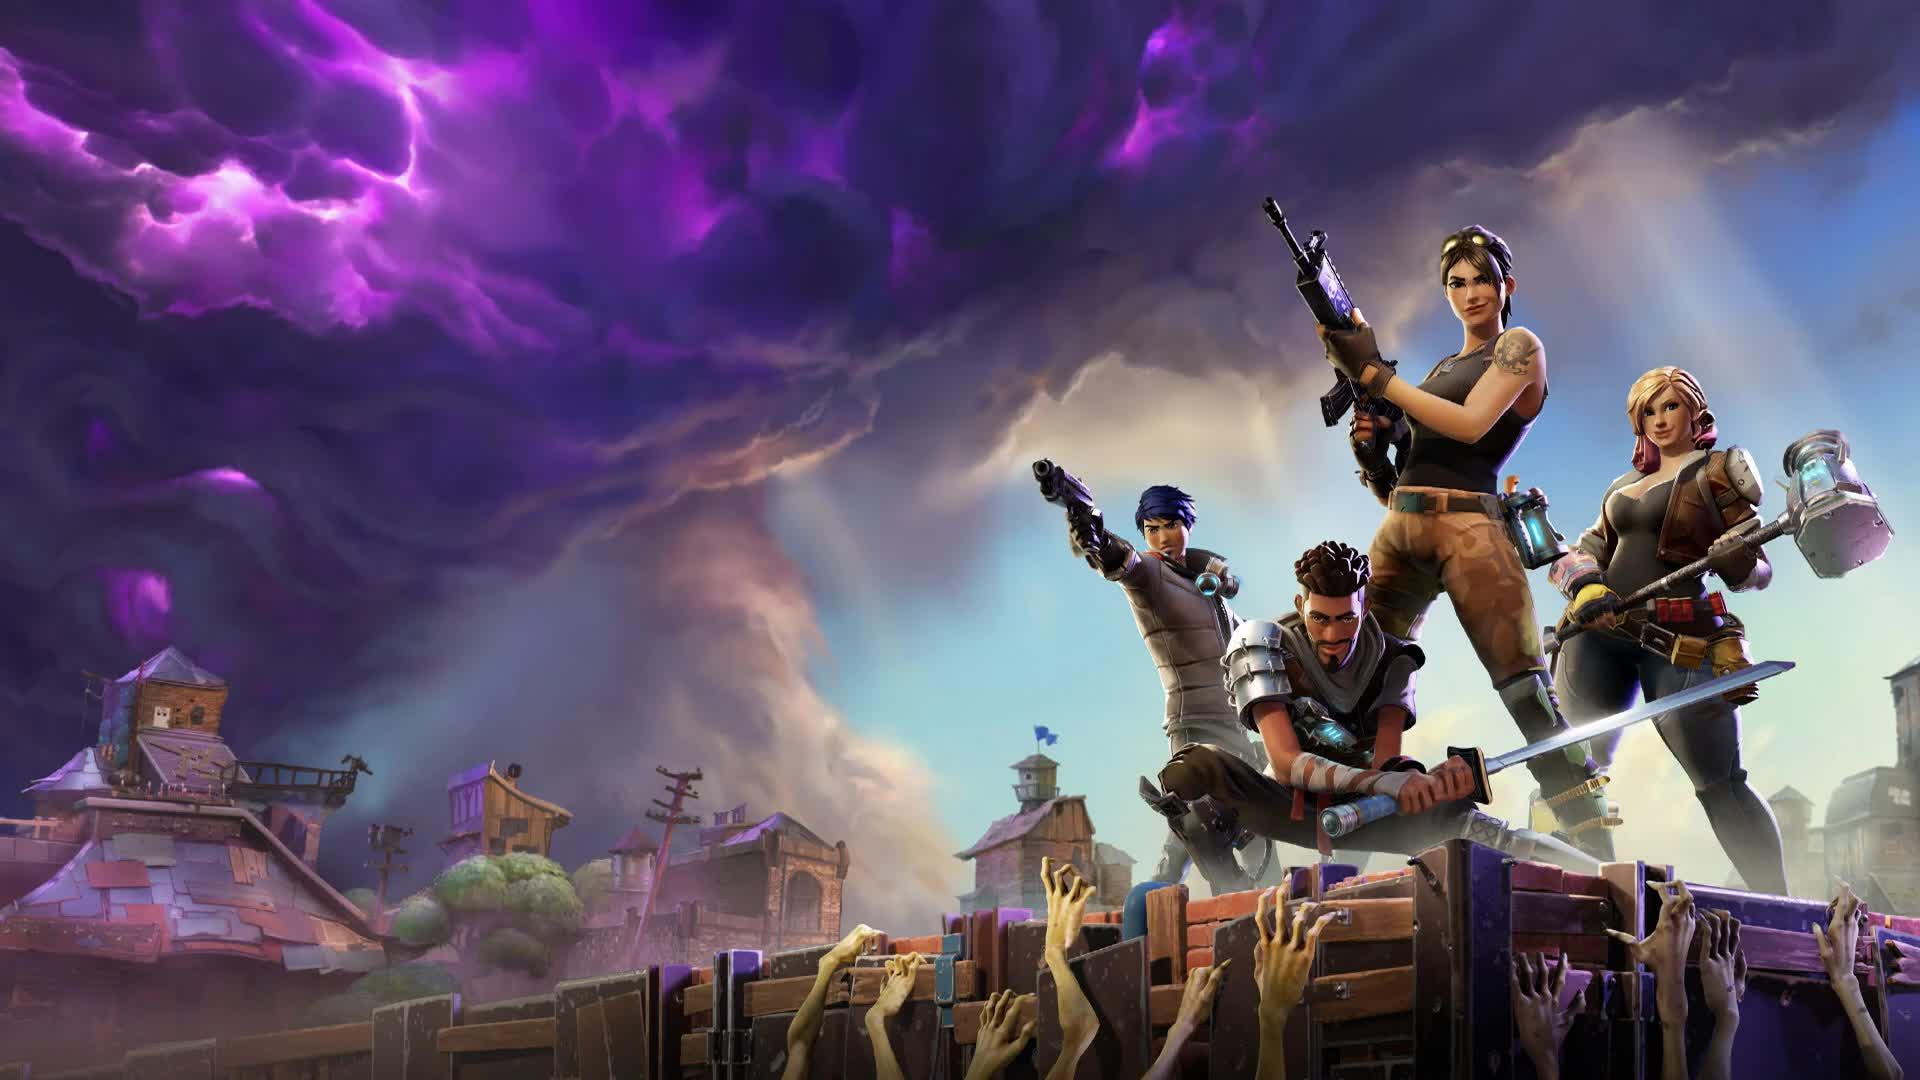 Fortnite Team Zombies Tornado Storm - Free Live Wallpaper ...